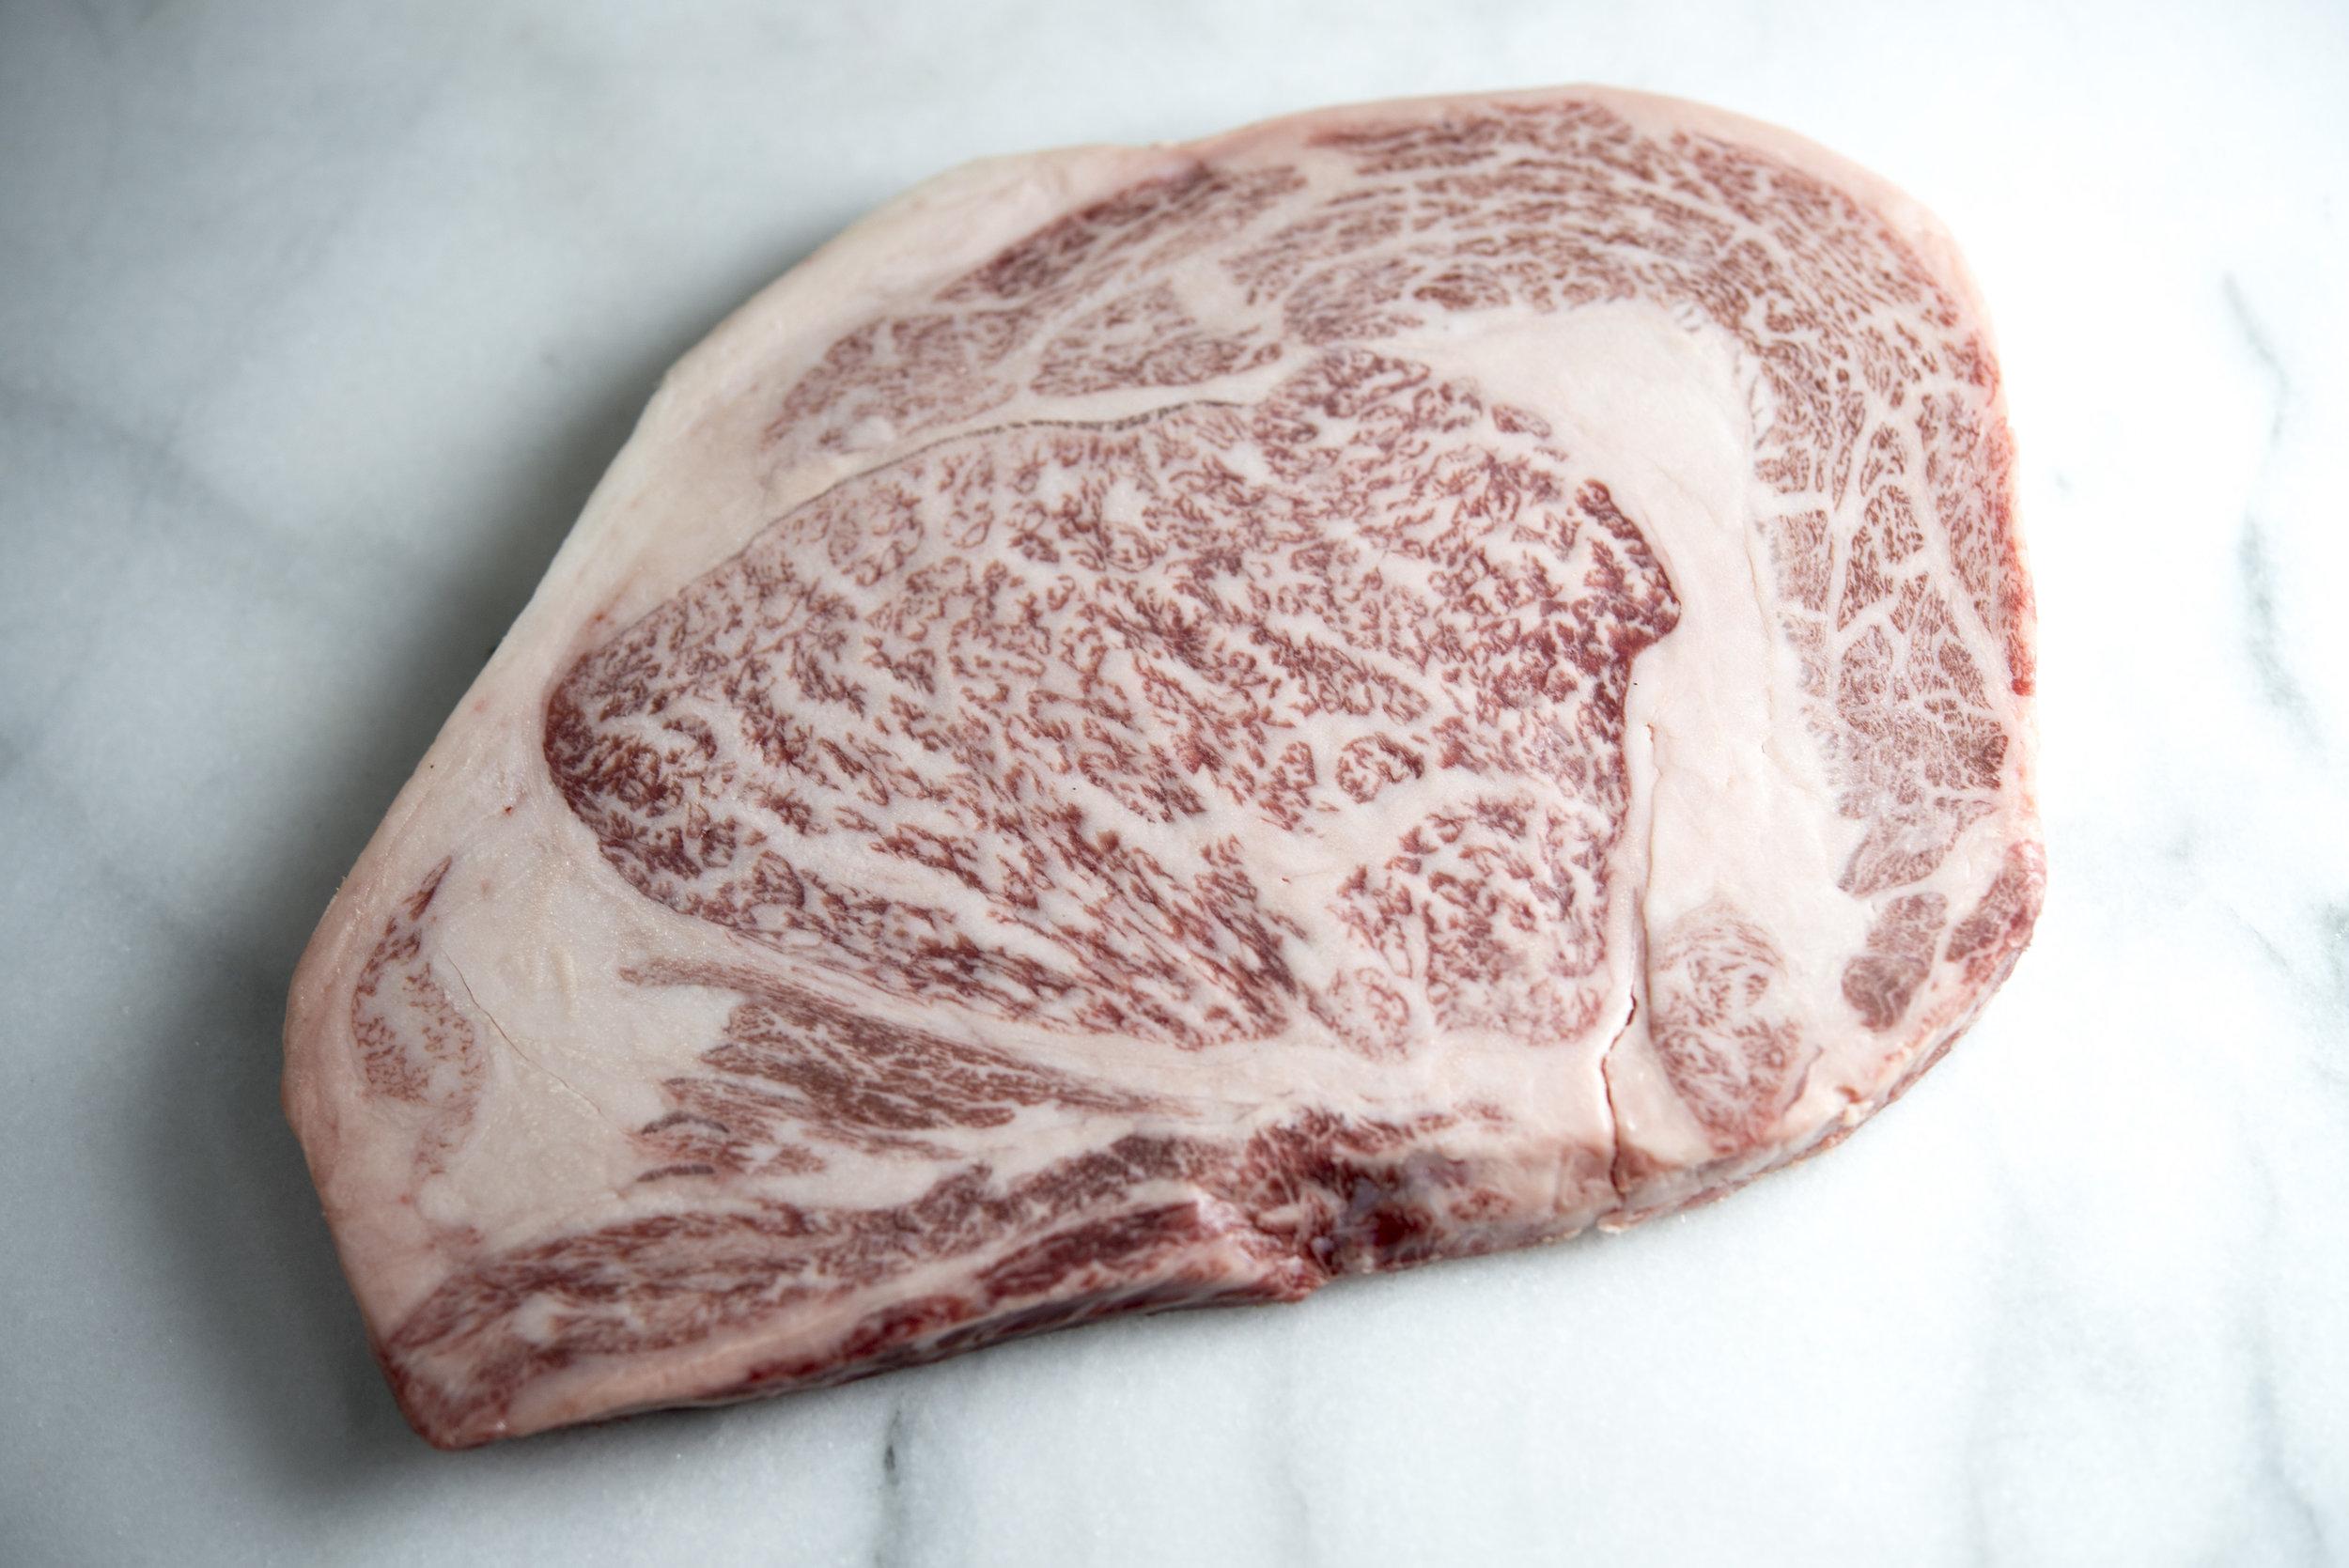 A5 Miyazakigyu Wagyu Beef Ribeye Steaks 03.jpg